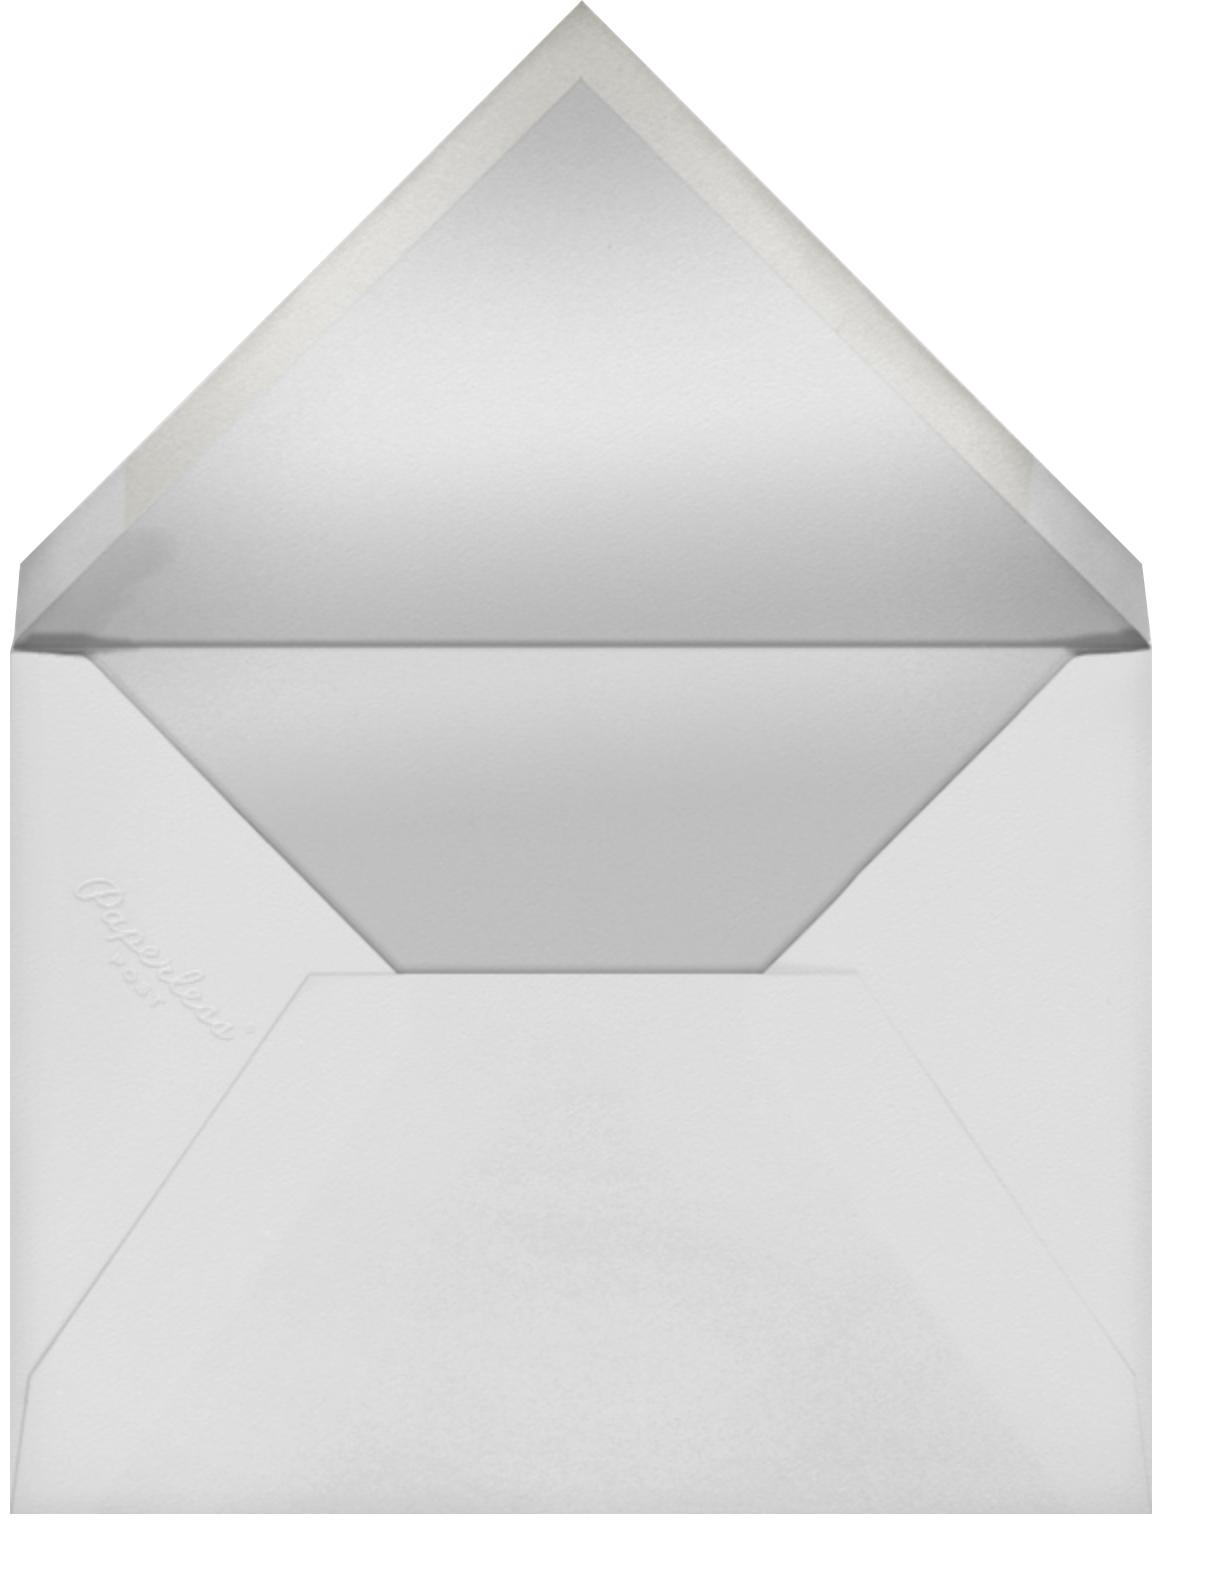 Kayitz I (Program) - Navy - Paperless Post - Envelope